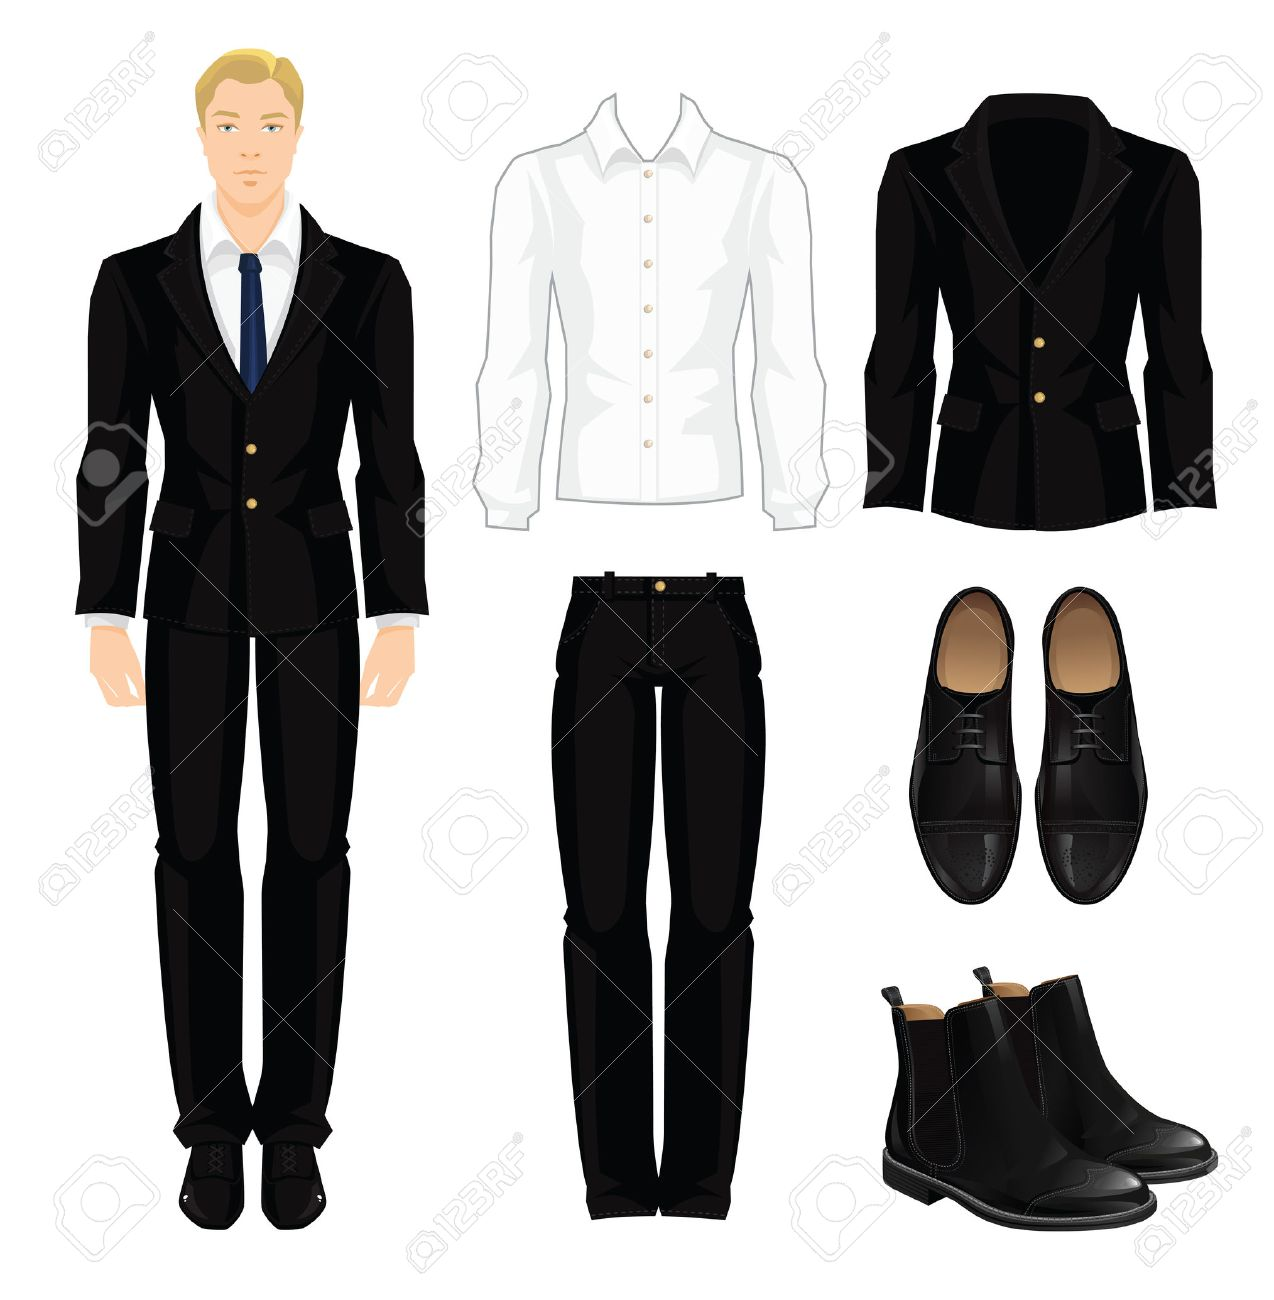 Vector Illustration Of Corporate Dress Code Office Uniform